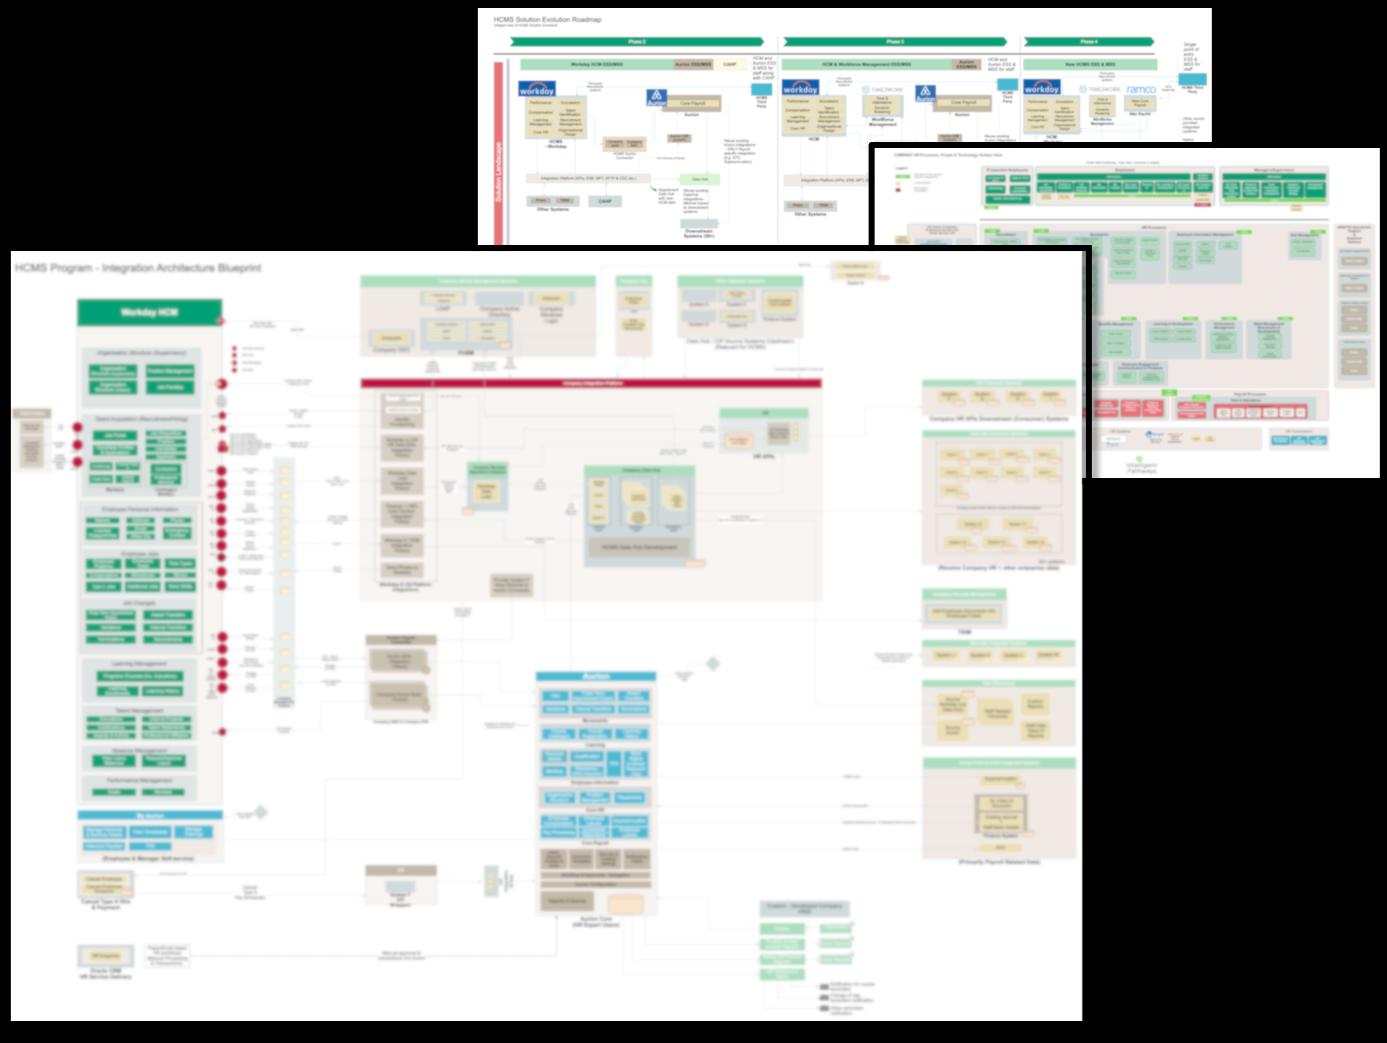 Blueprint - HCM Transformation Example Artifacts